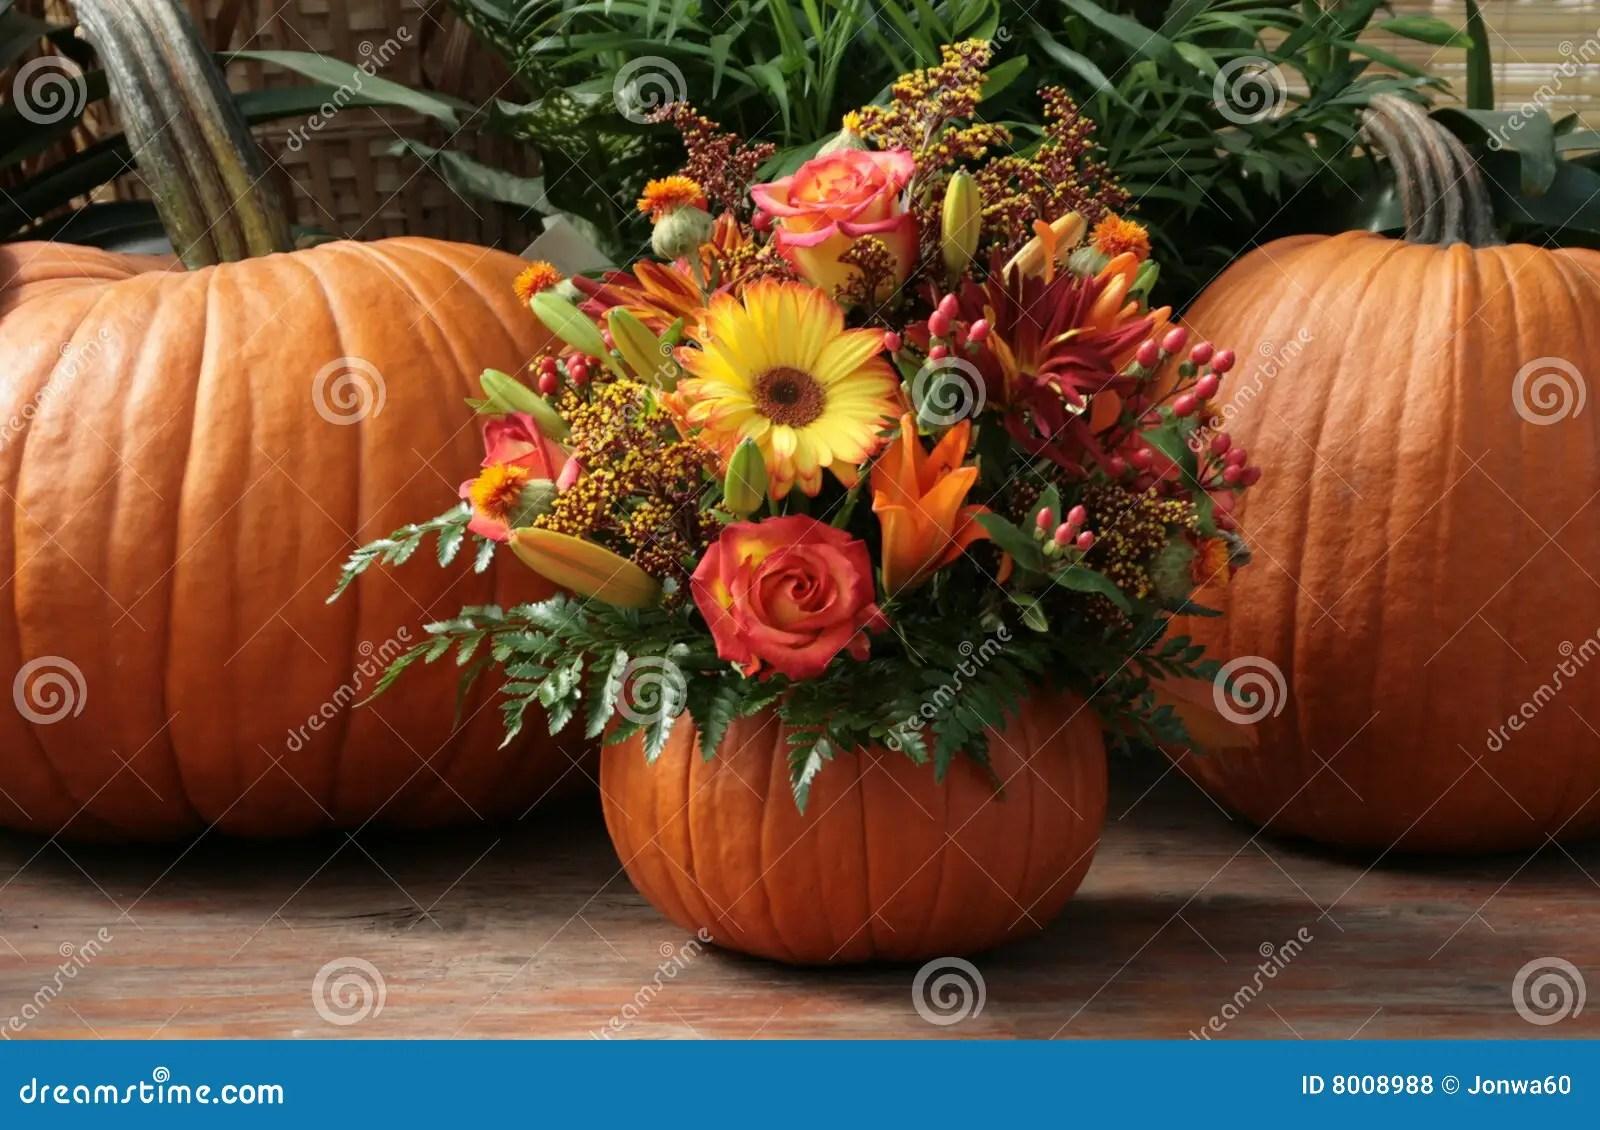 Pumpkin Floral Royalty Free Stock Photos  Image 8008988